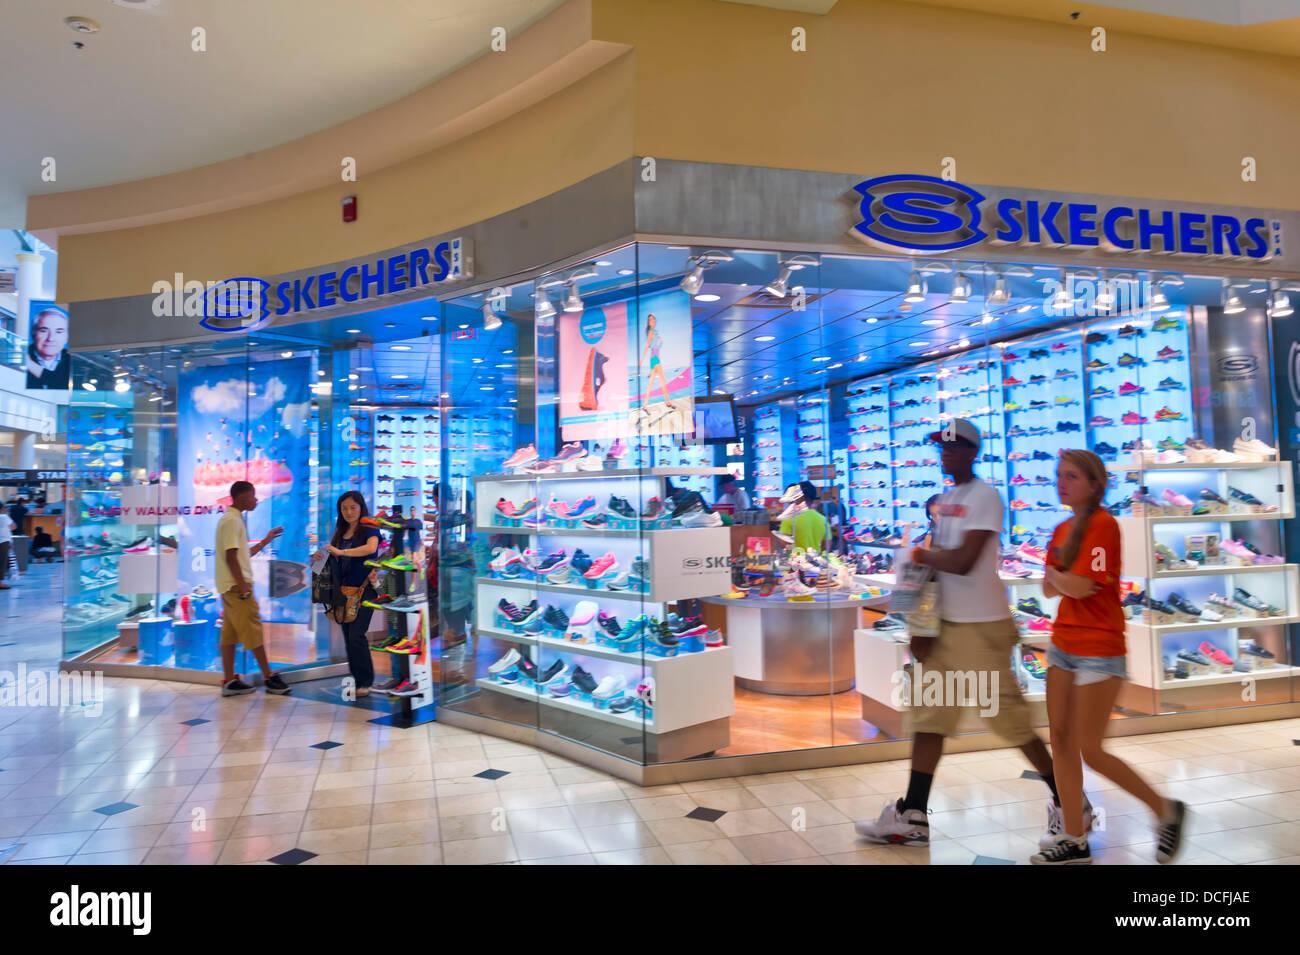 New Skechers Shoes Immagini e Fotos Stock Alamy